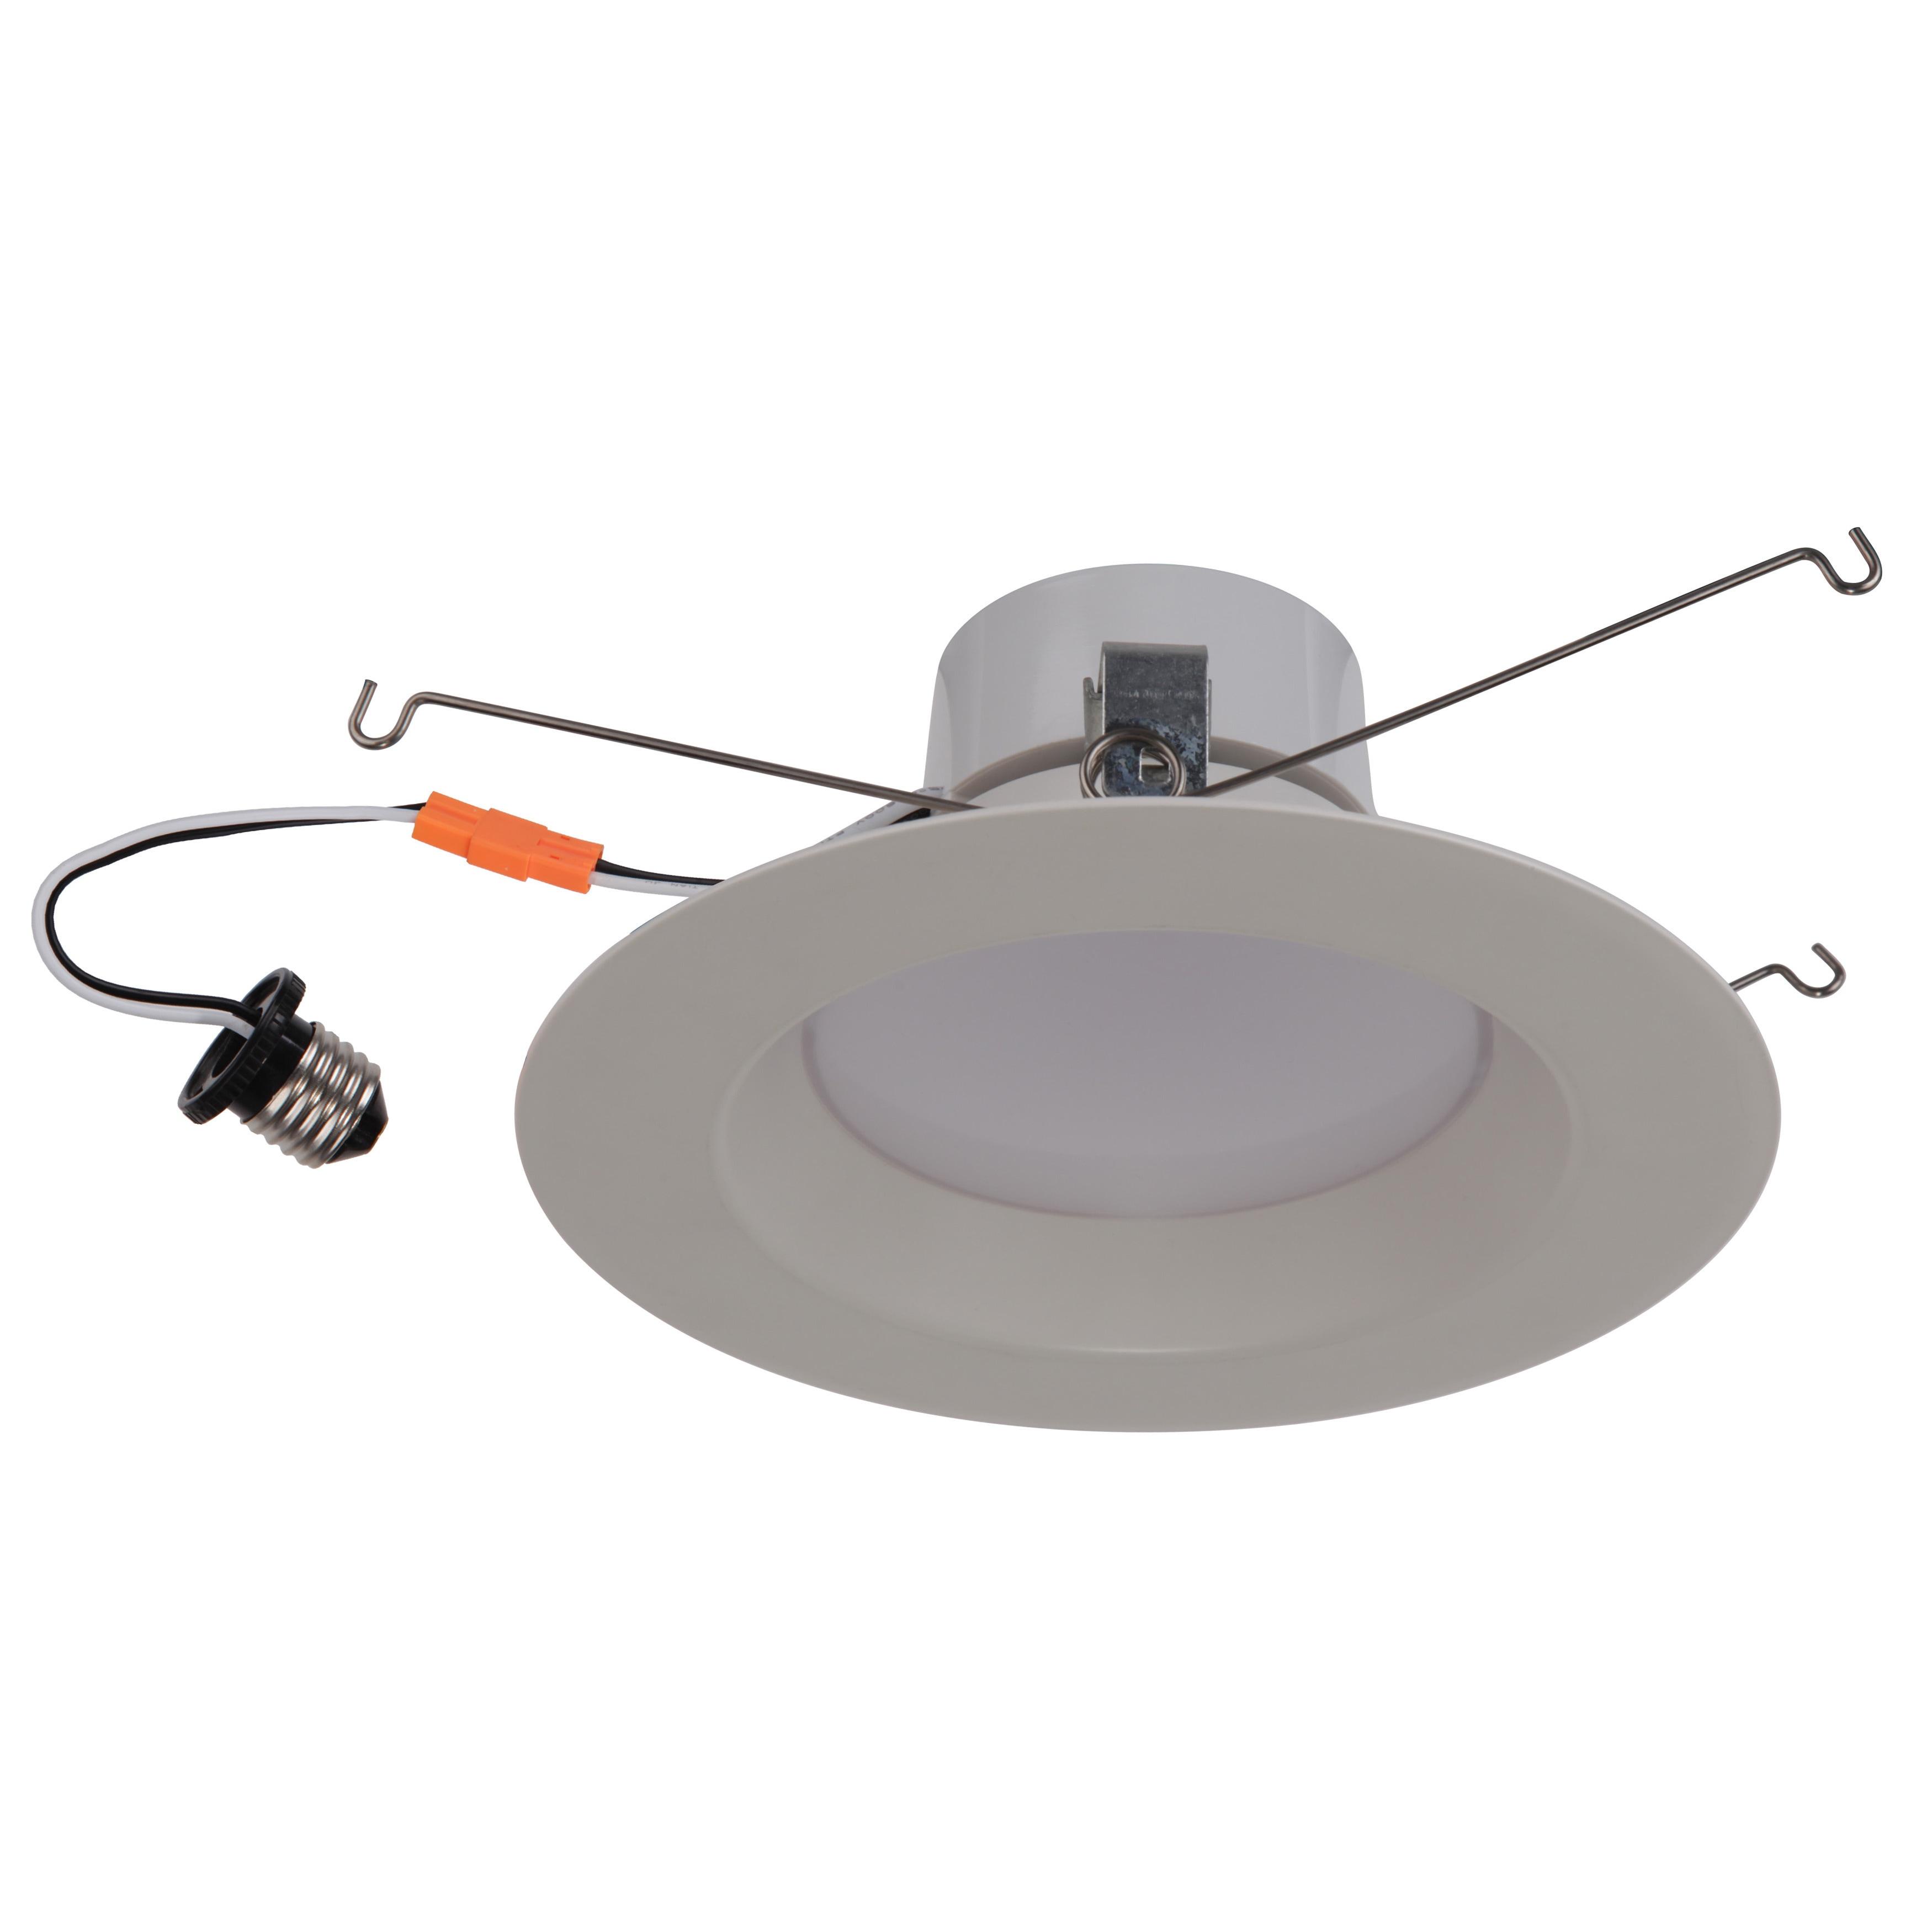 Goodlite White Acrylic Round Retrofit 18-watt LED Dimmabl...